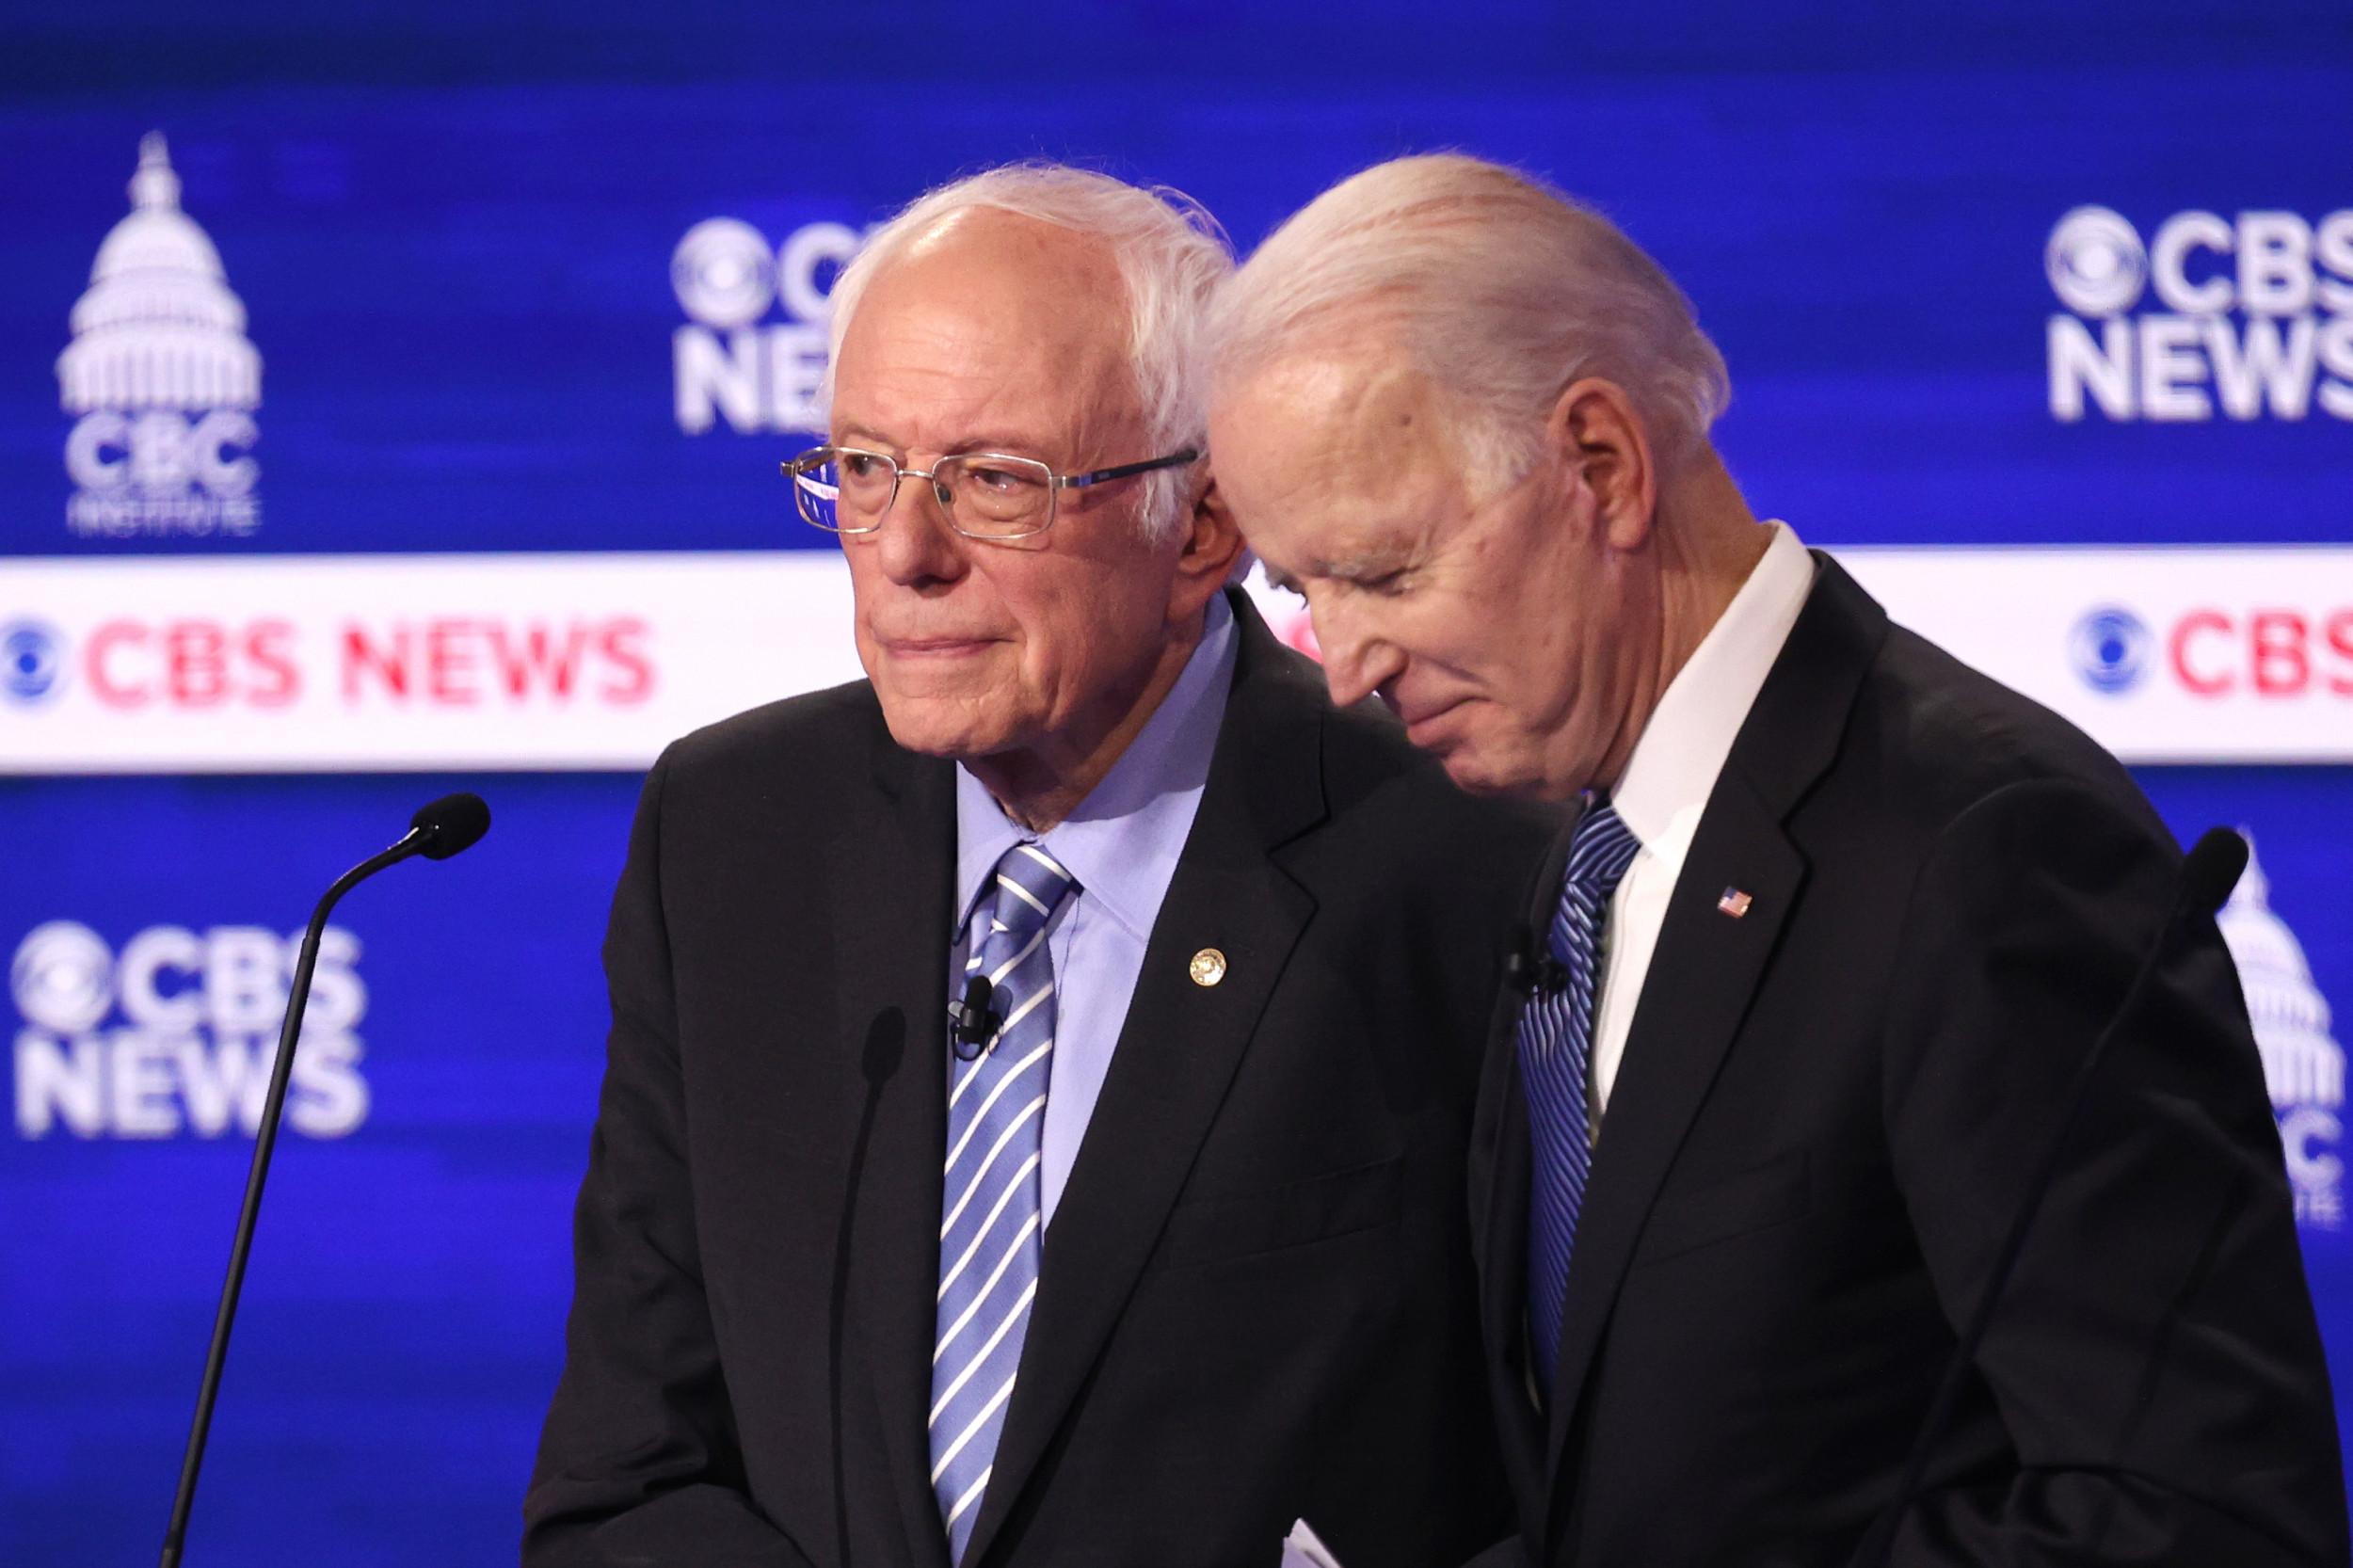 Democratic unity will send Biden to the White House | Opinion